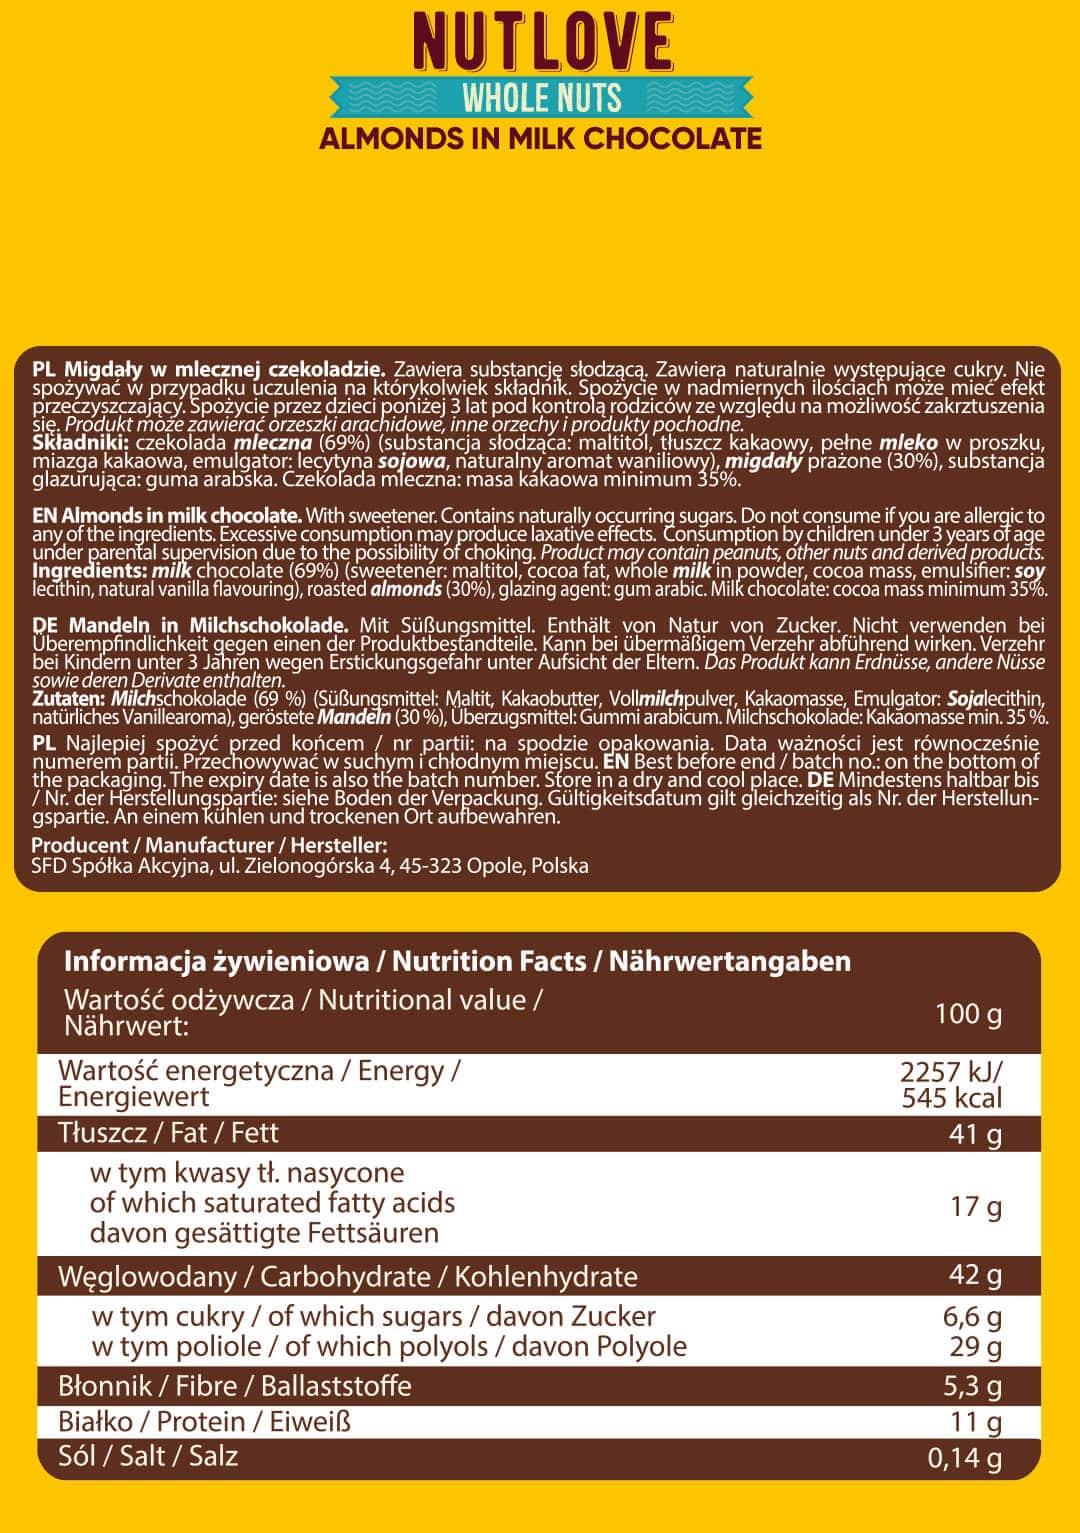 nutlove-whole-nuts-almonds-in-milk-chocolate